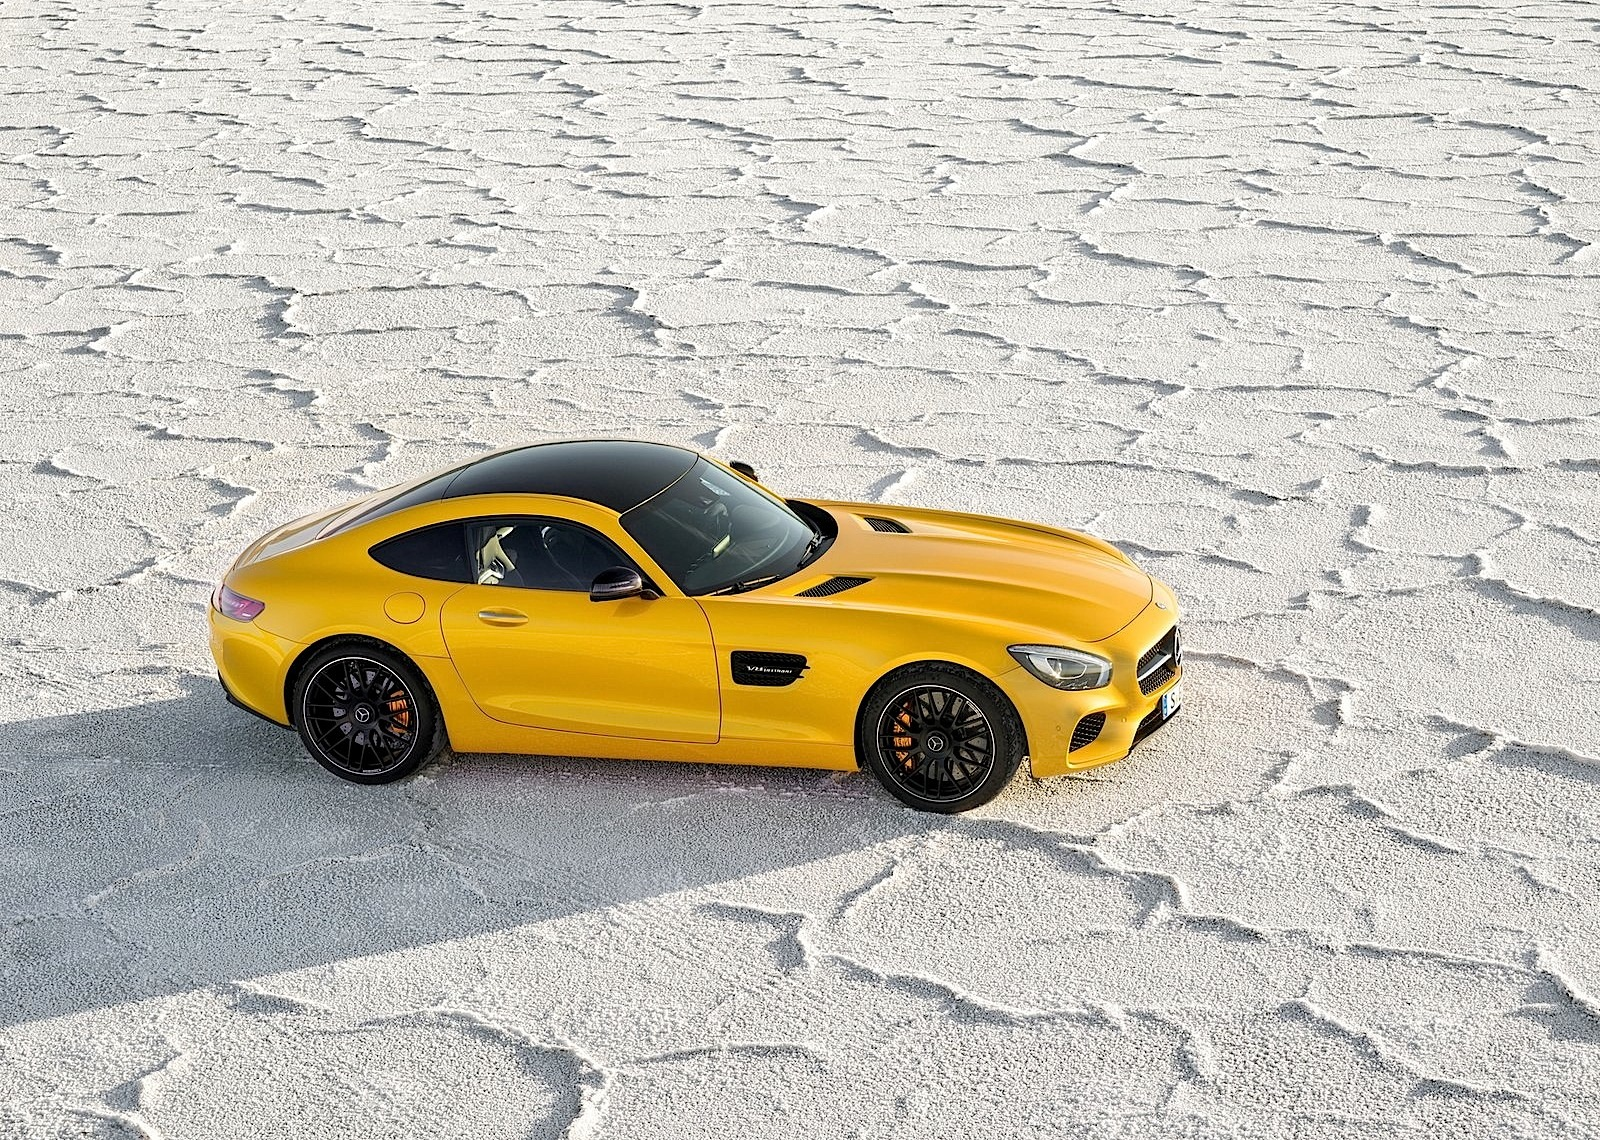 Mercedes benz amg gt c190 specs 2015 2016 2017 for 2015 mercedes benz amg gt